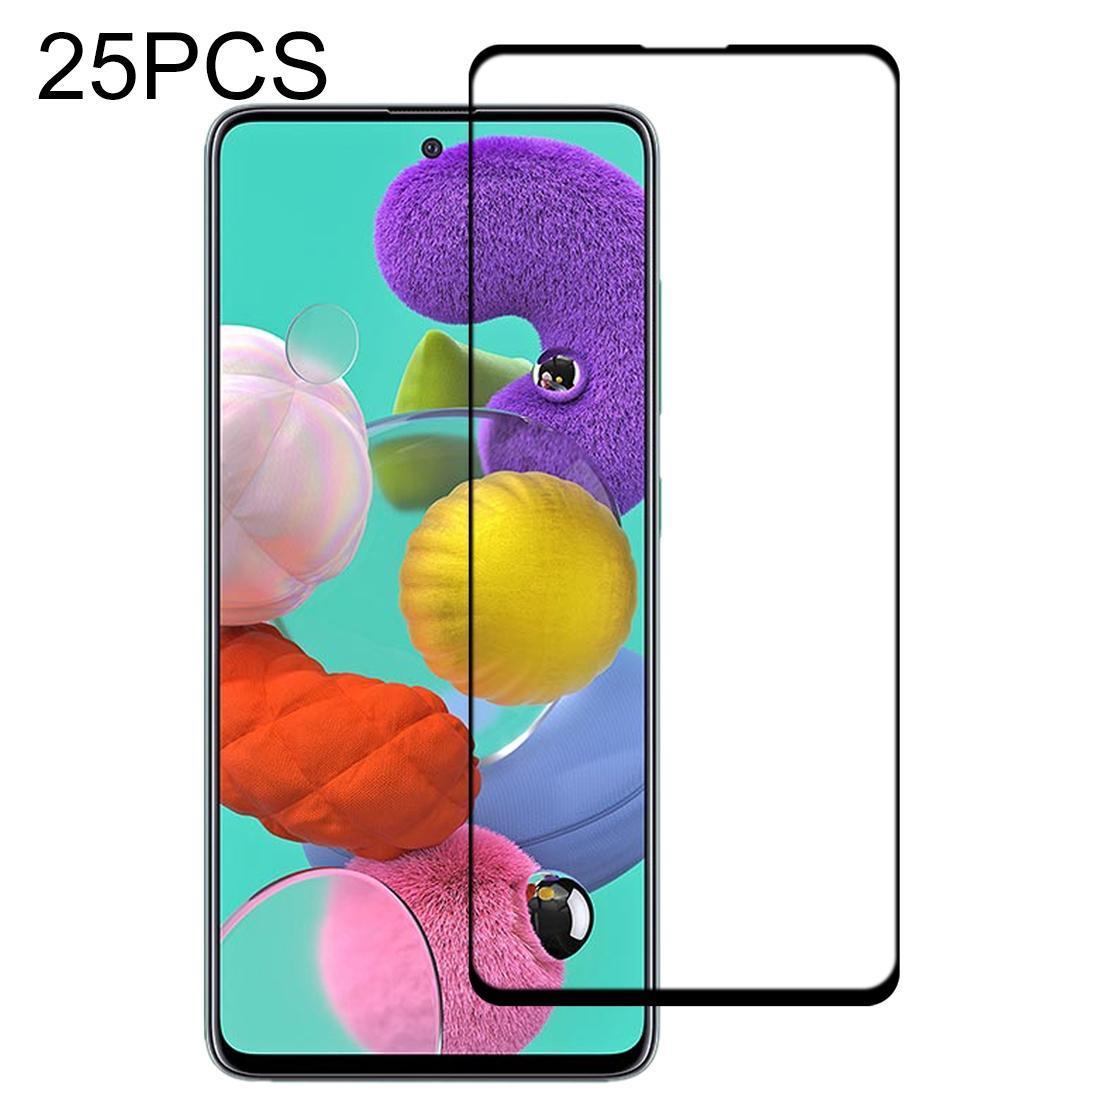 25 PCS 9 H Yüzey Sertlik 2.5D Tam Tutkal Tam Ekran Temperli Film İçin Galaxy A51